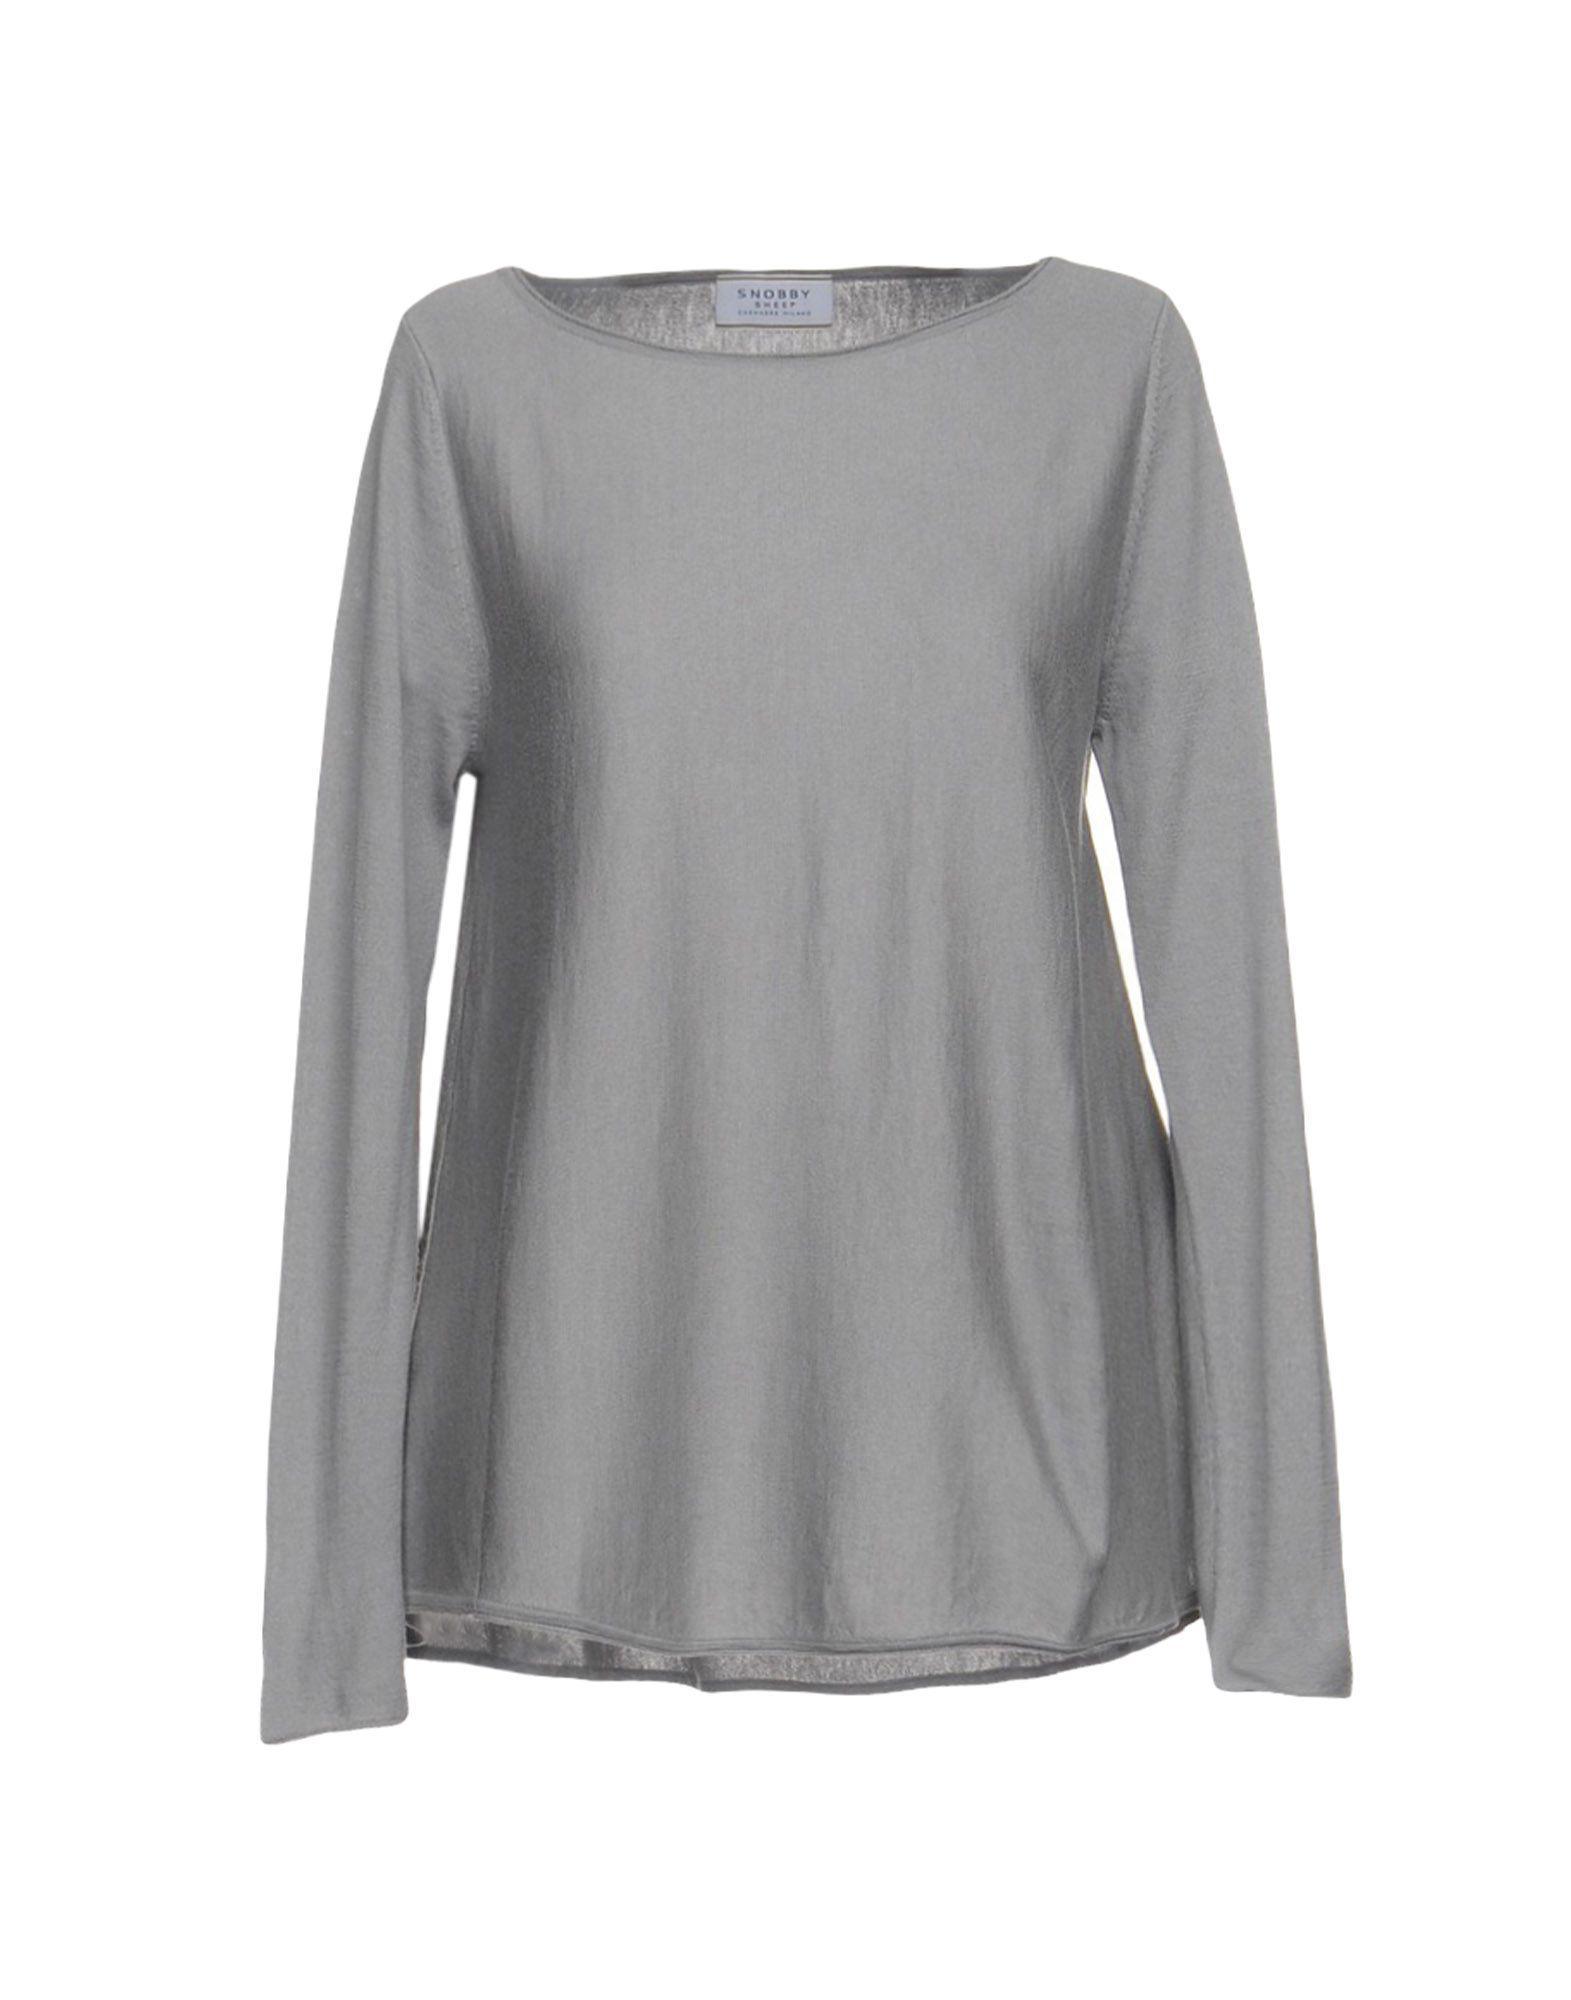 Snobby Sheep Sweater In Light Grey